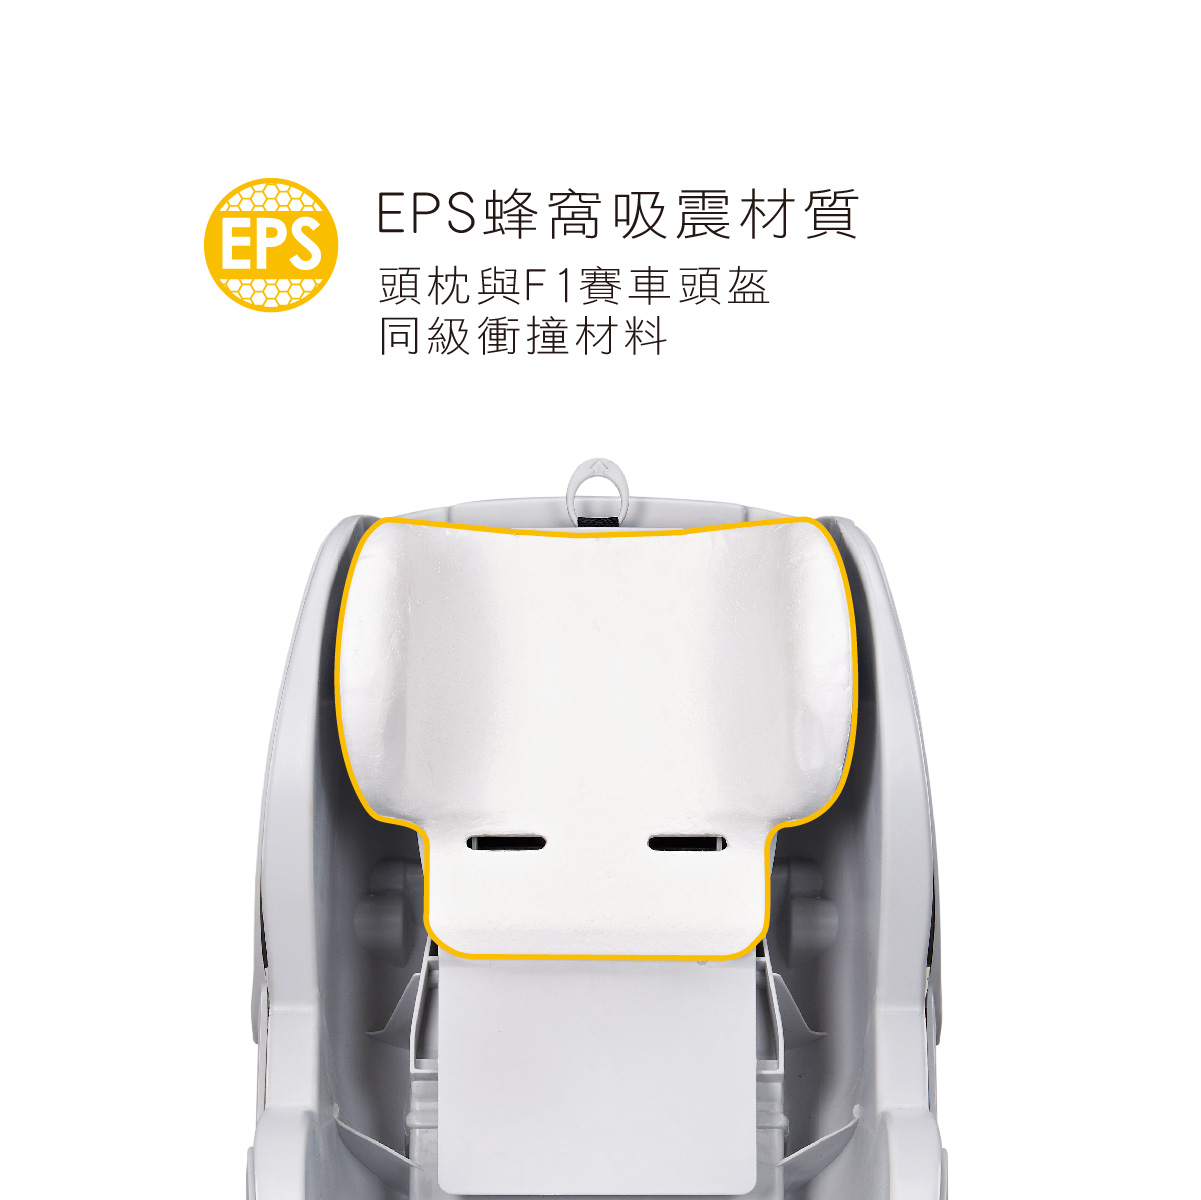 proimages/Tip_Accessories_Series/safety_seat/6039/6039_EDM_1200x1200-3-13.jpg